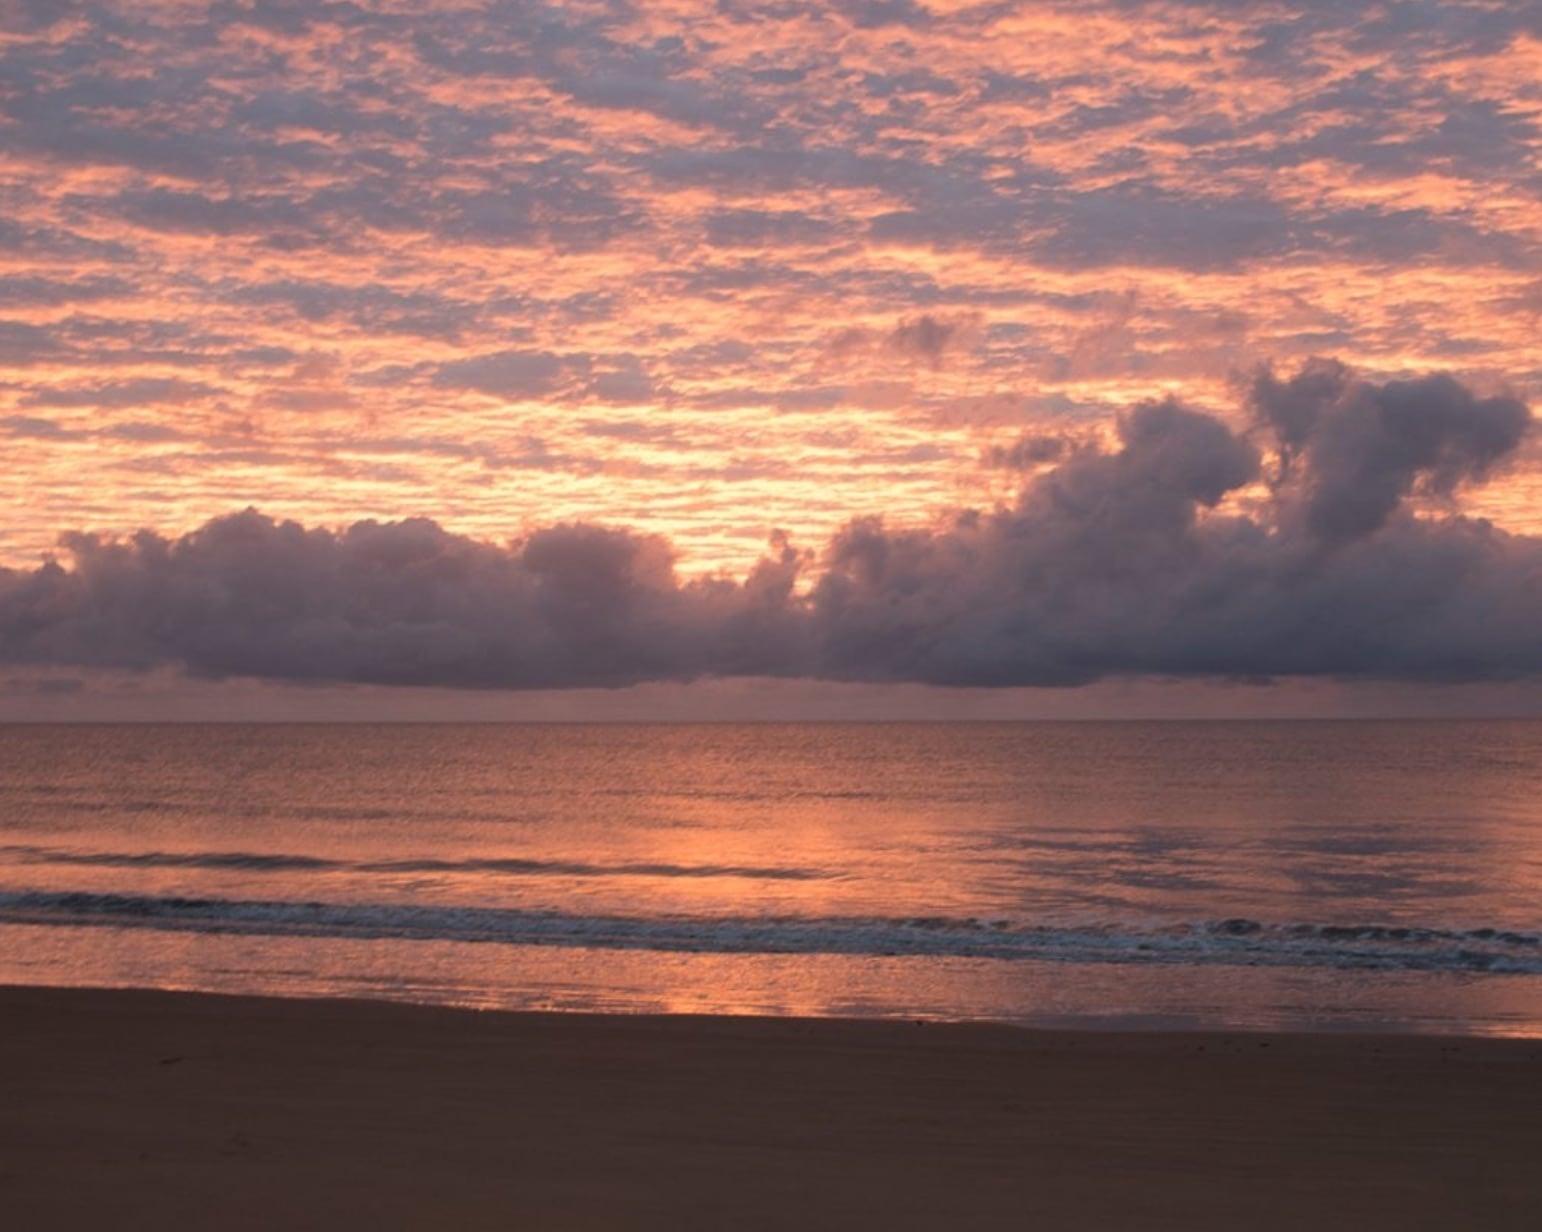 Camping in Australien direkt am Meer